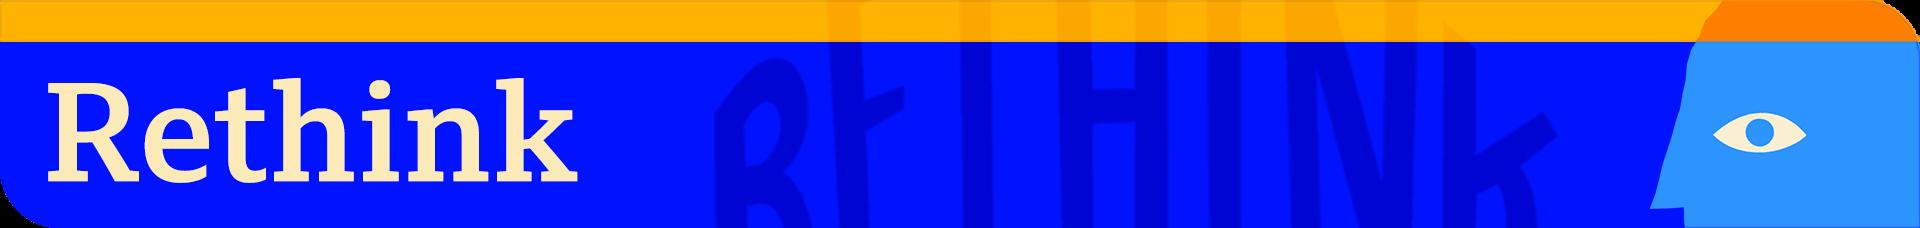 Rethink logo banner